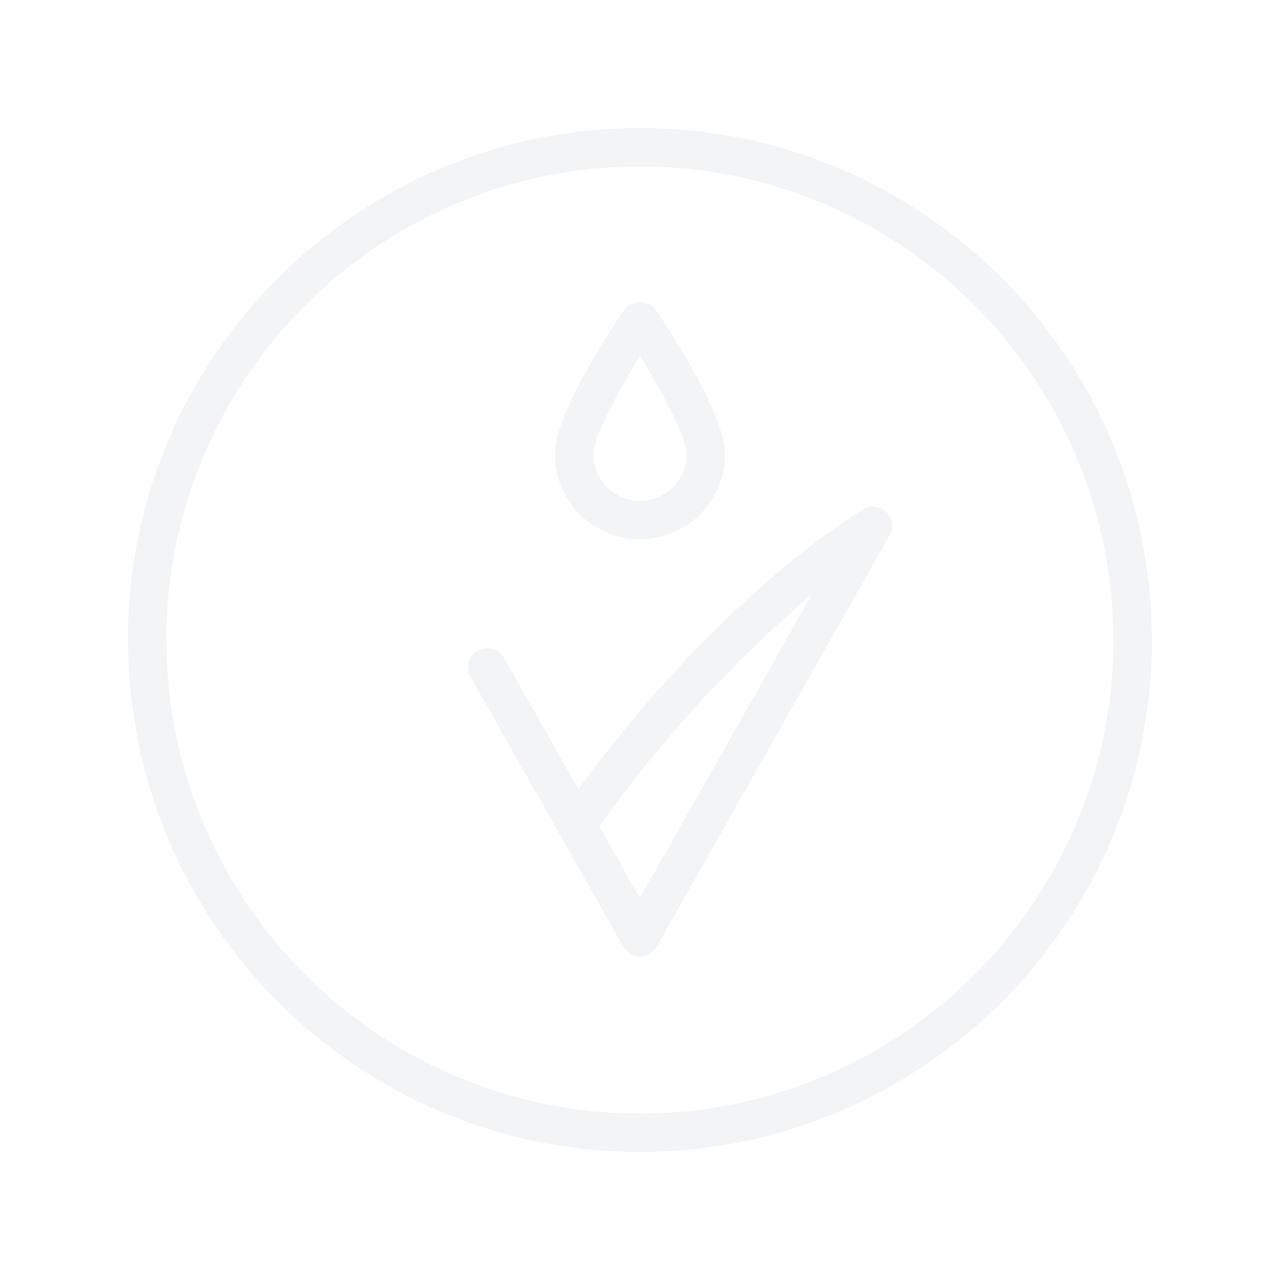 MISSHA Near Skin Madecanol Multi Balm 18g